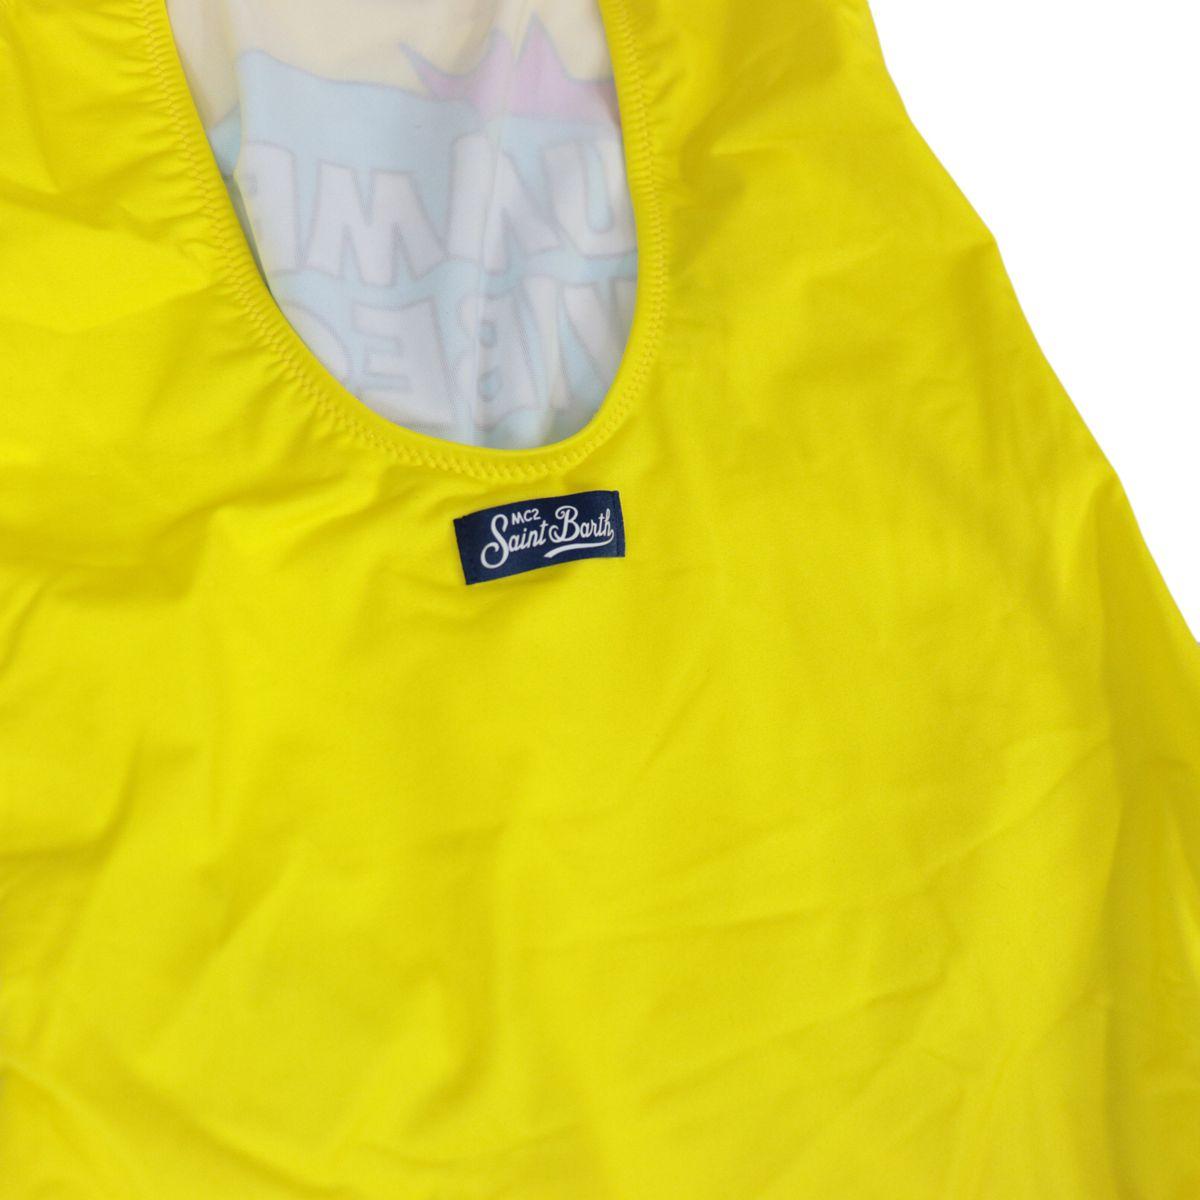 Cara summer swimsuit vibes pop 91 Yellow MC2 Saint Barth